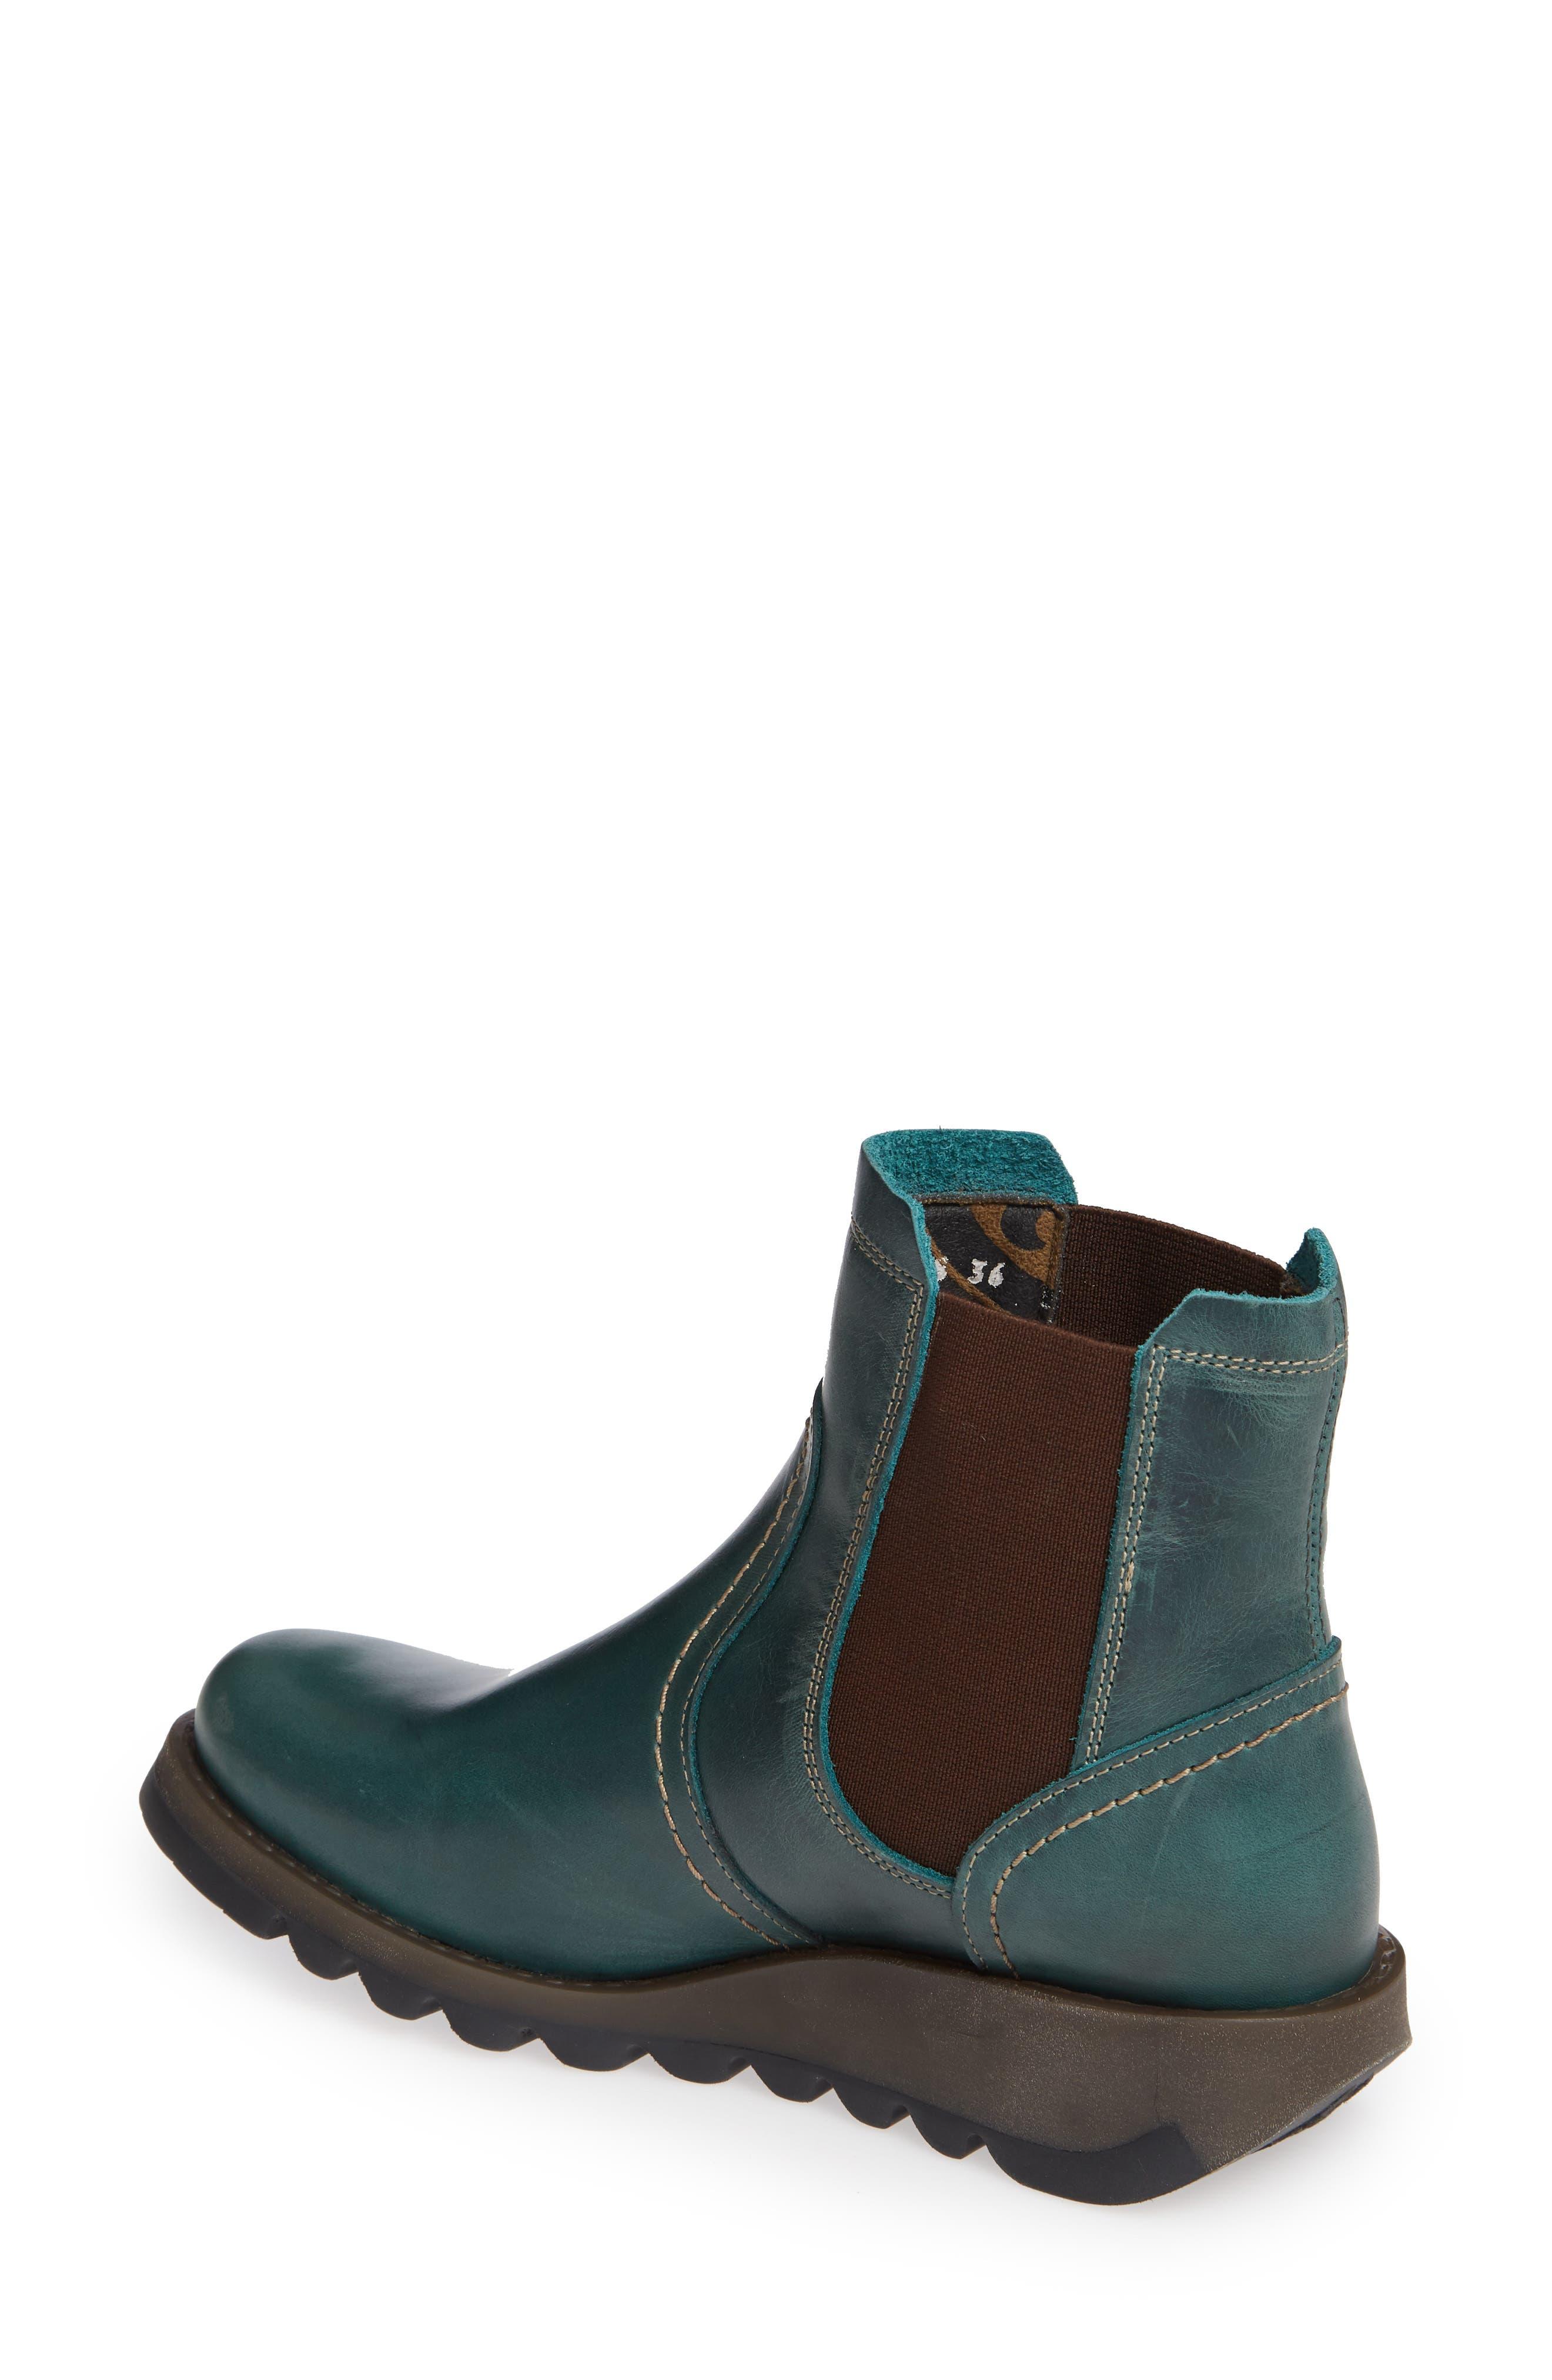 Scon Waterproof Gore-Tex<sup>®</sup> Chelsea Boot,                             Alternate thumbnail 2, color,                             PETROL